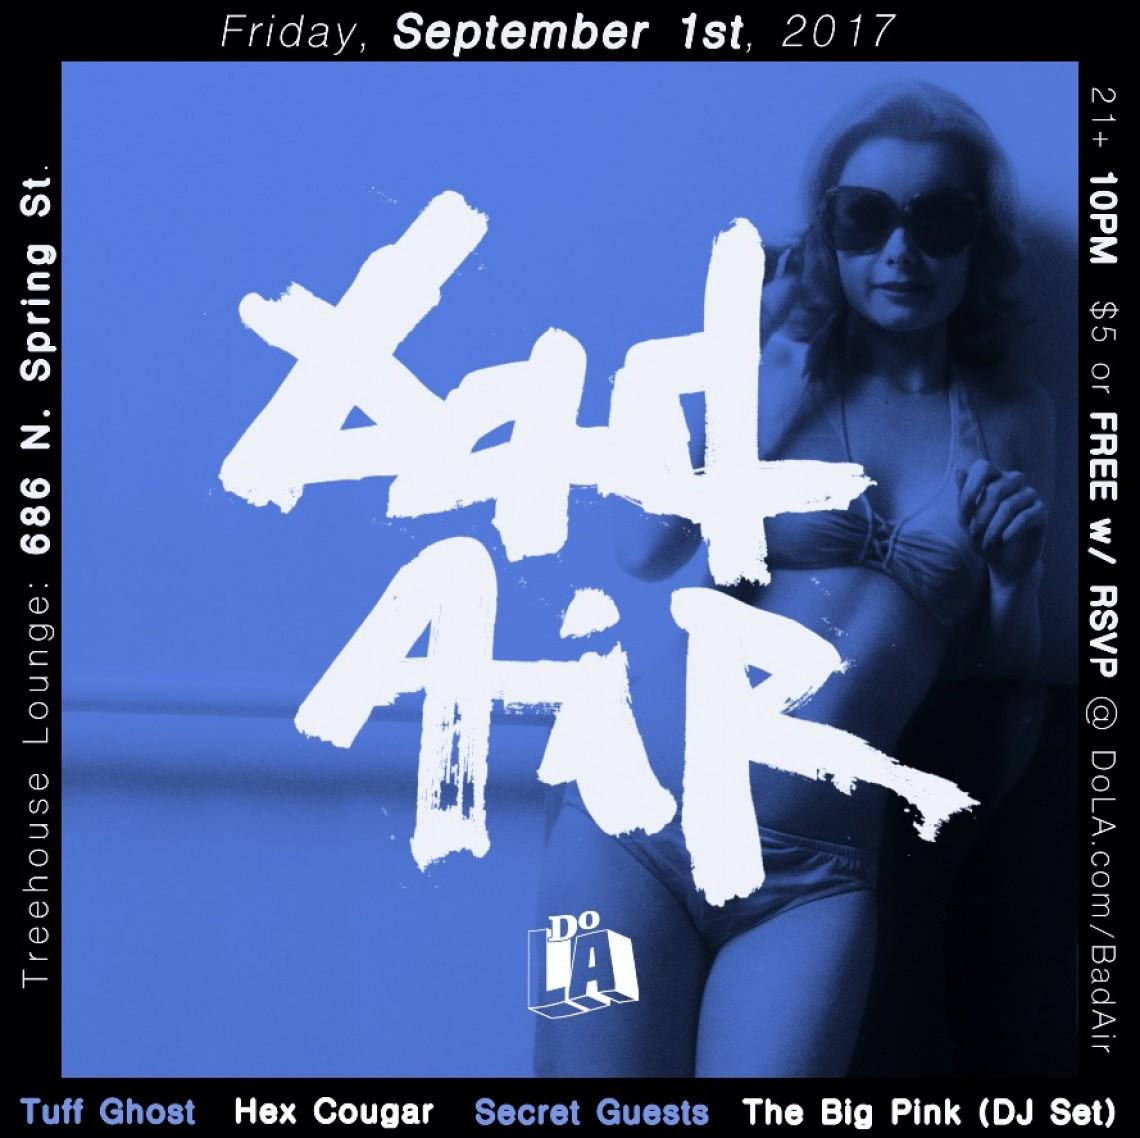 Bad Air - 09.01.17